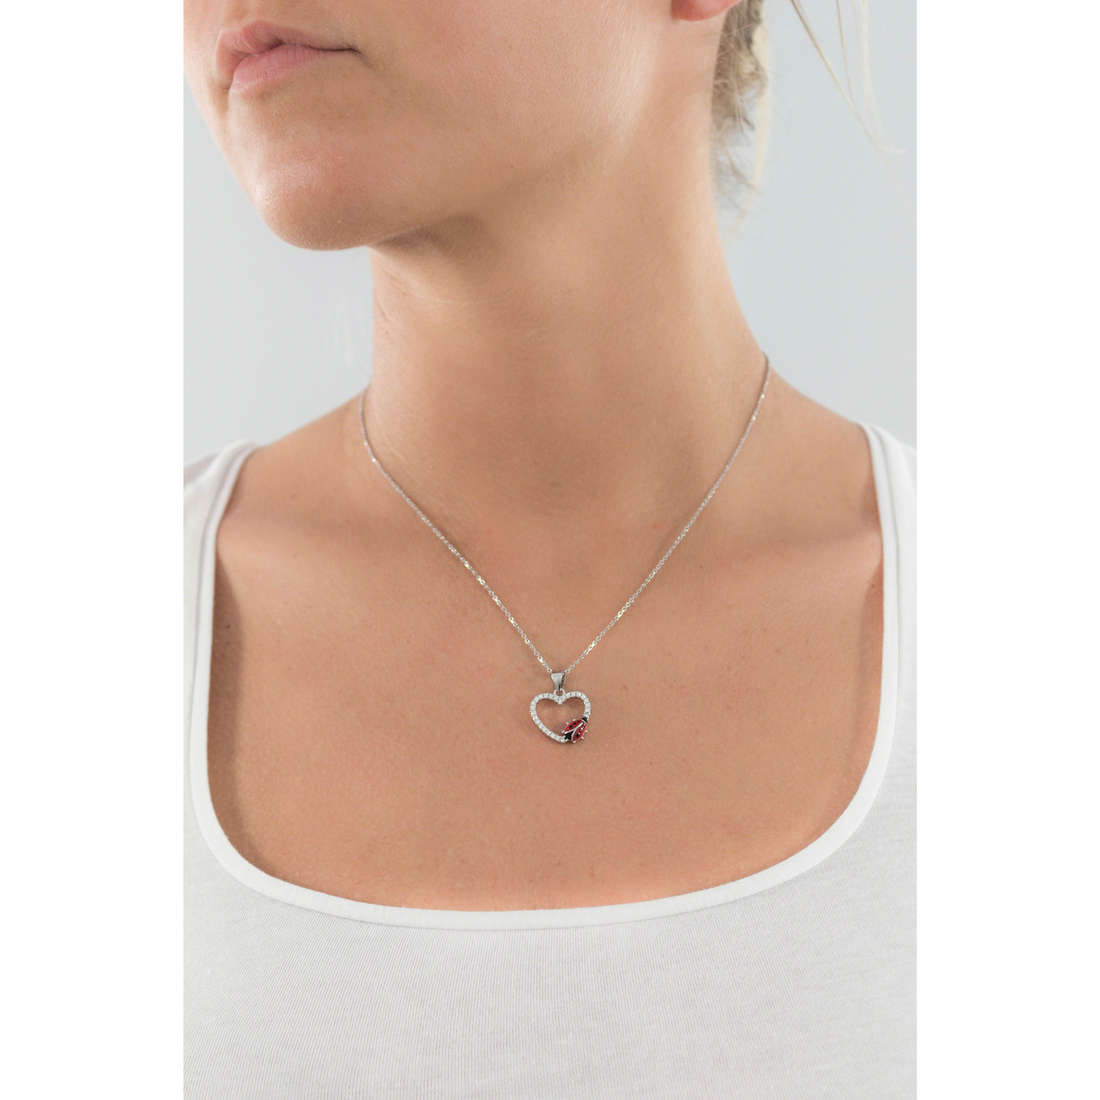 GioiaPura colliers femme GPSRBS0389F-R-43 indosso